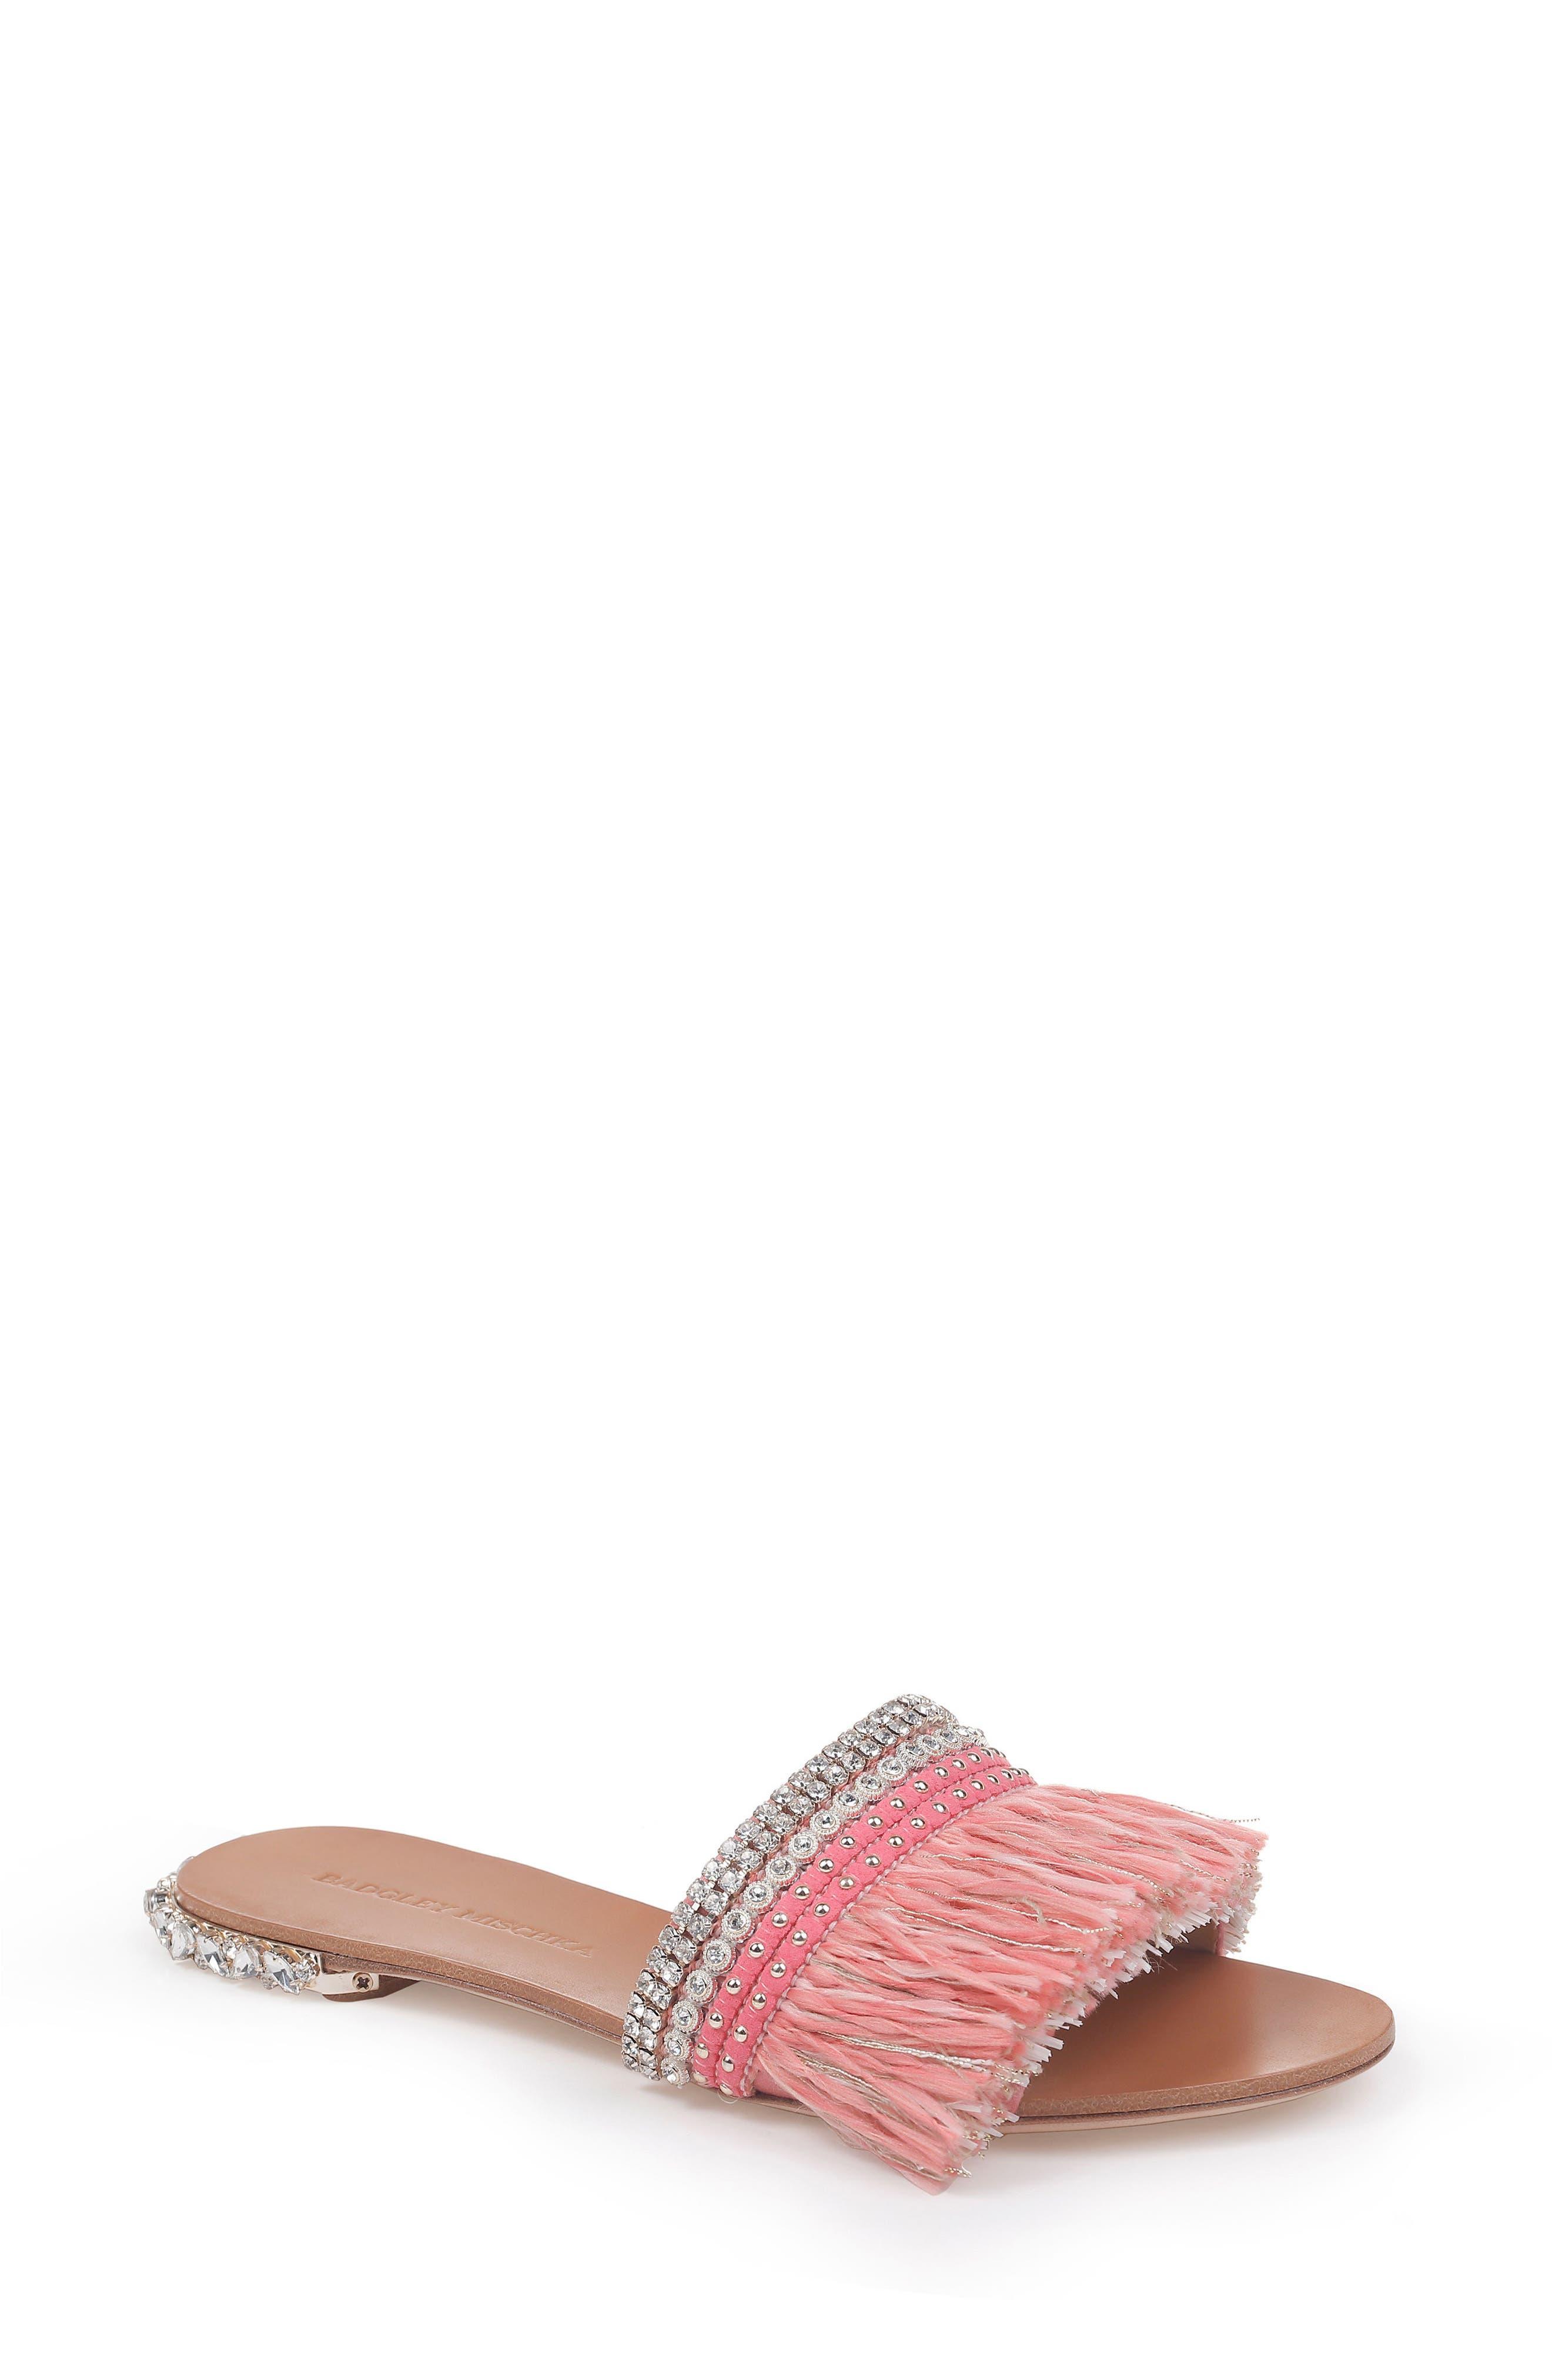 Badgley Mischka Sharlene Sandal